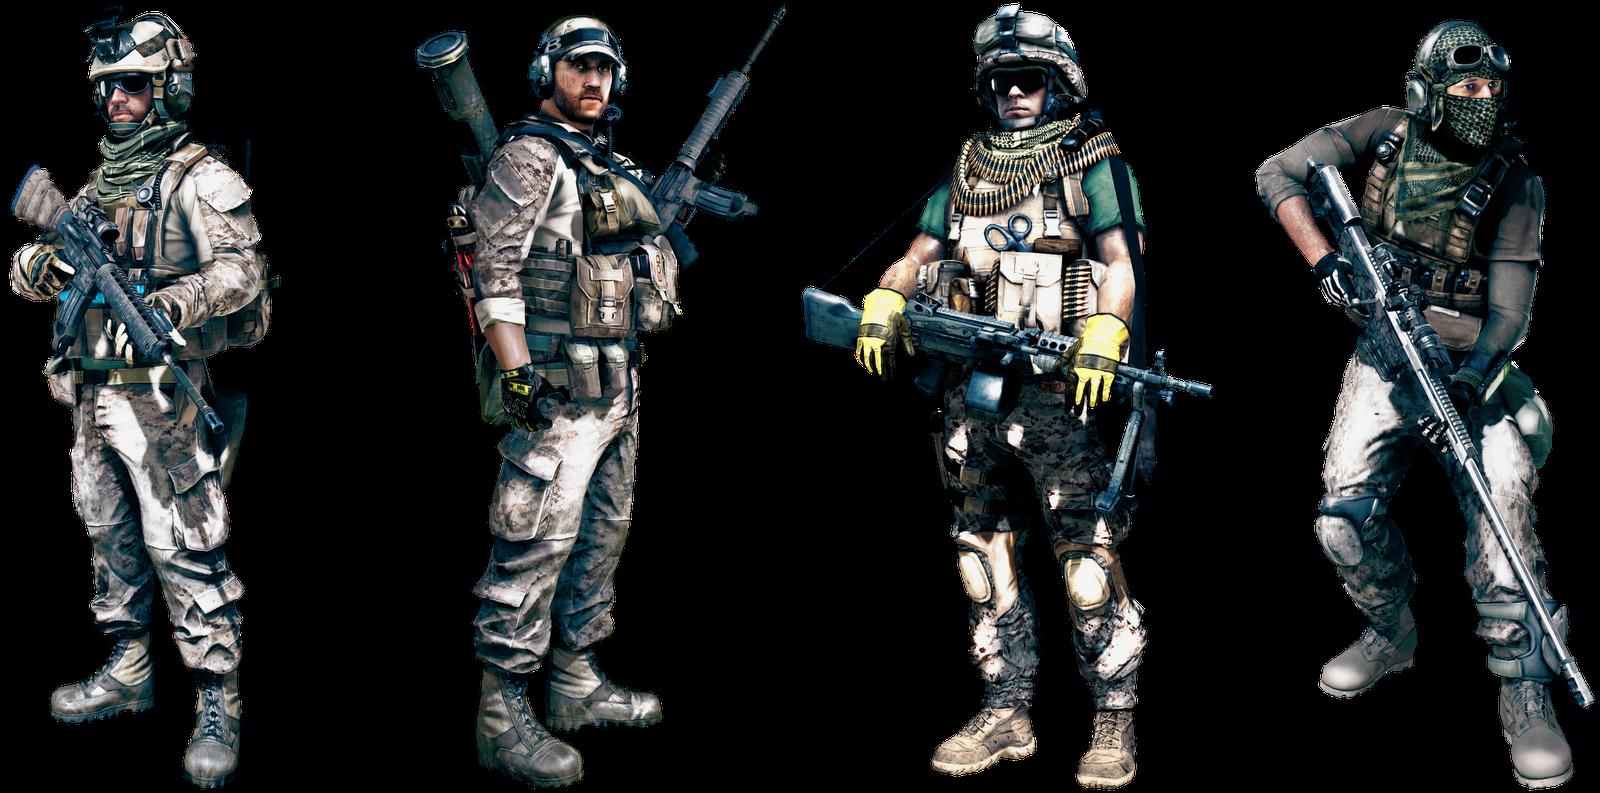 Battlefield 3 Full Version Pc Sk3pk0t4b3lud